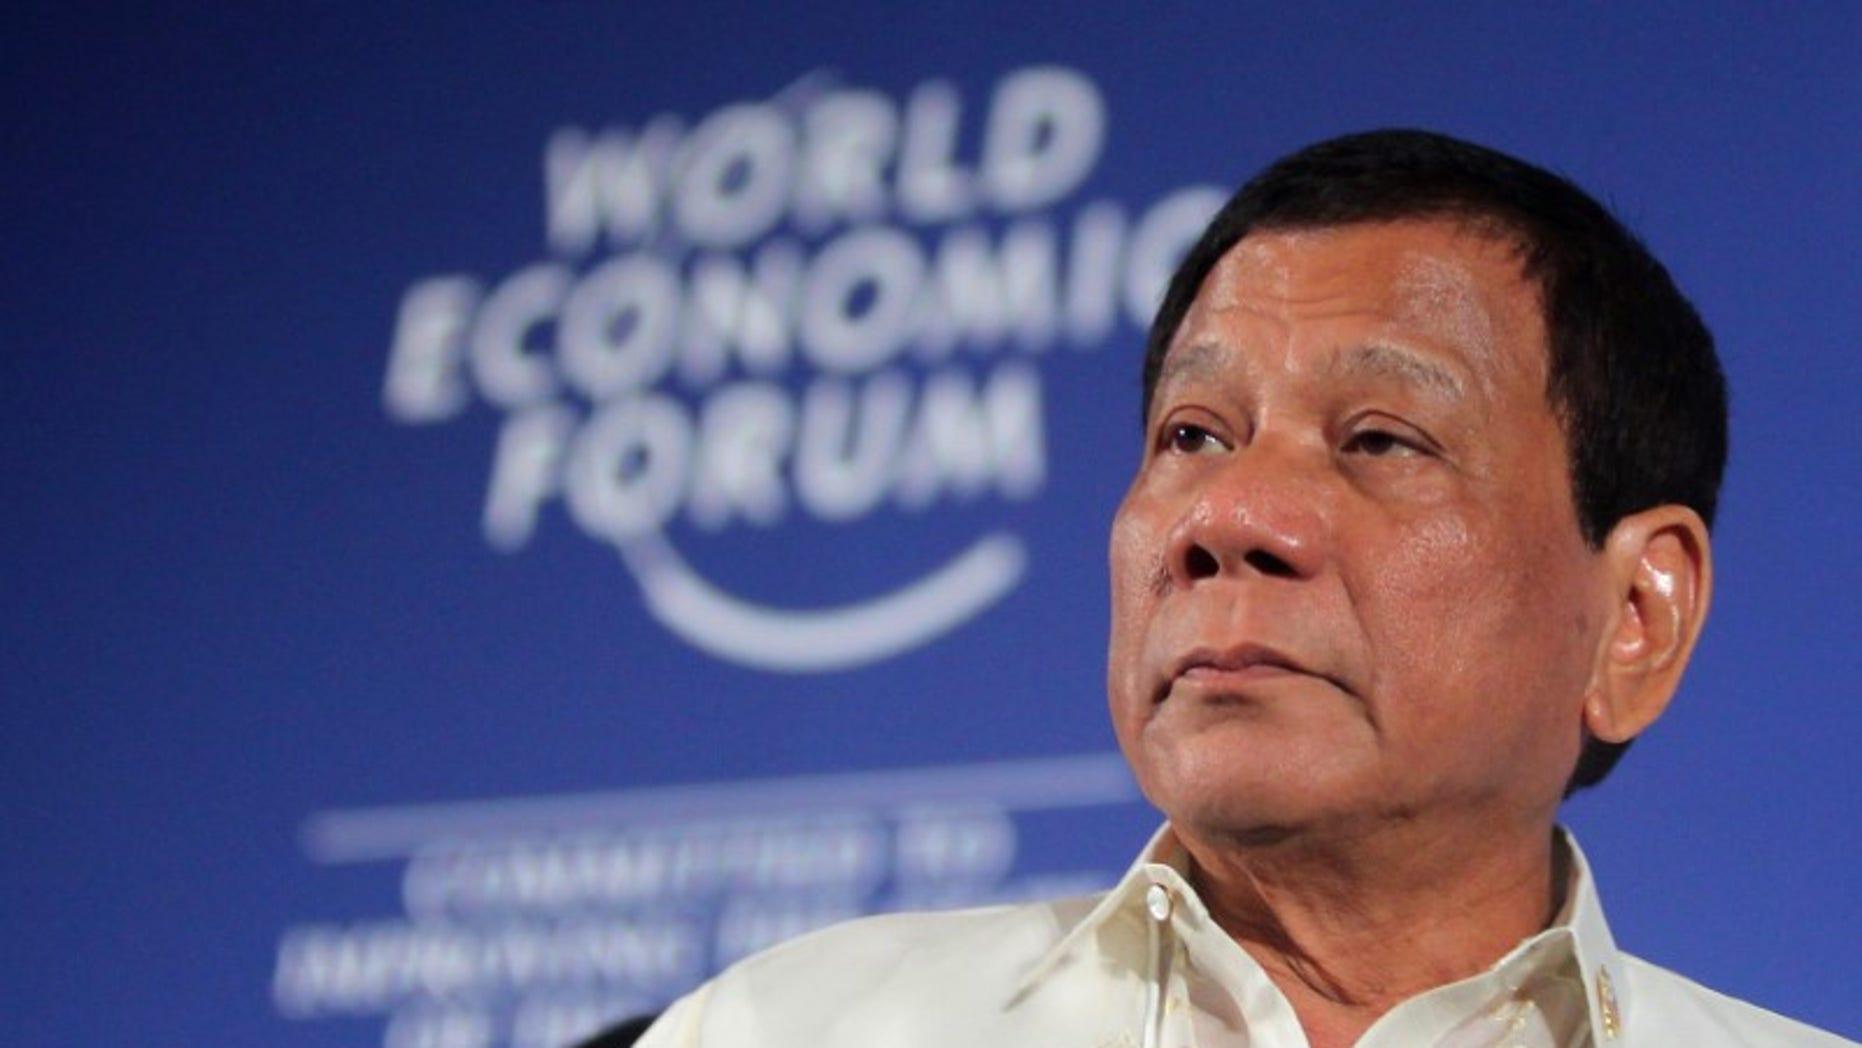 Philippine President Rodrigo Duterte attends the World Economic Forum on ASEAN in Phnom Penh